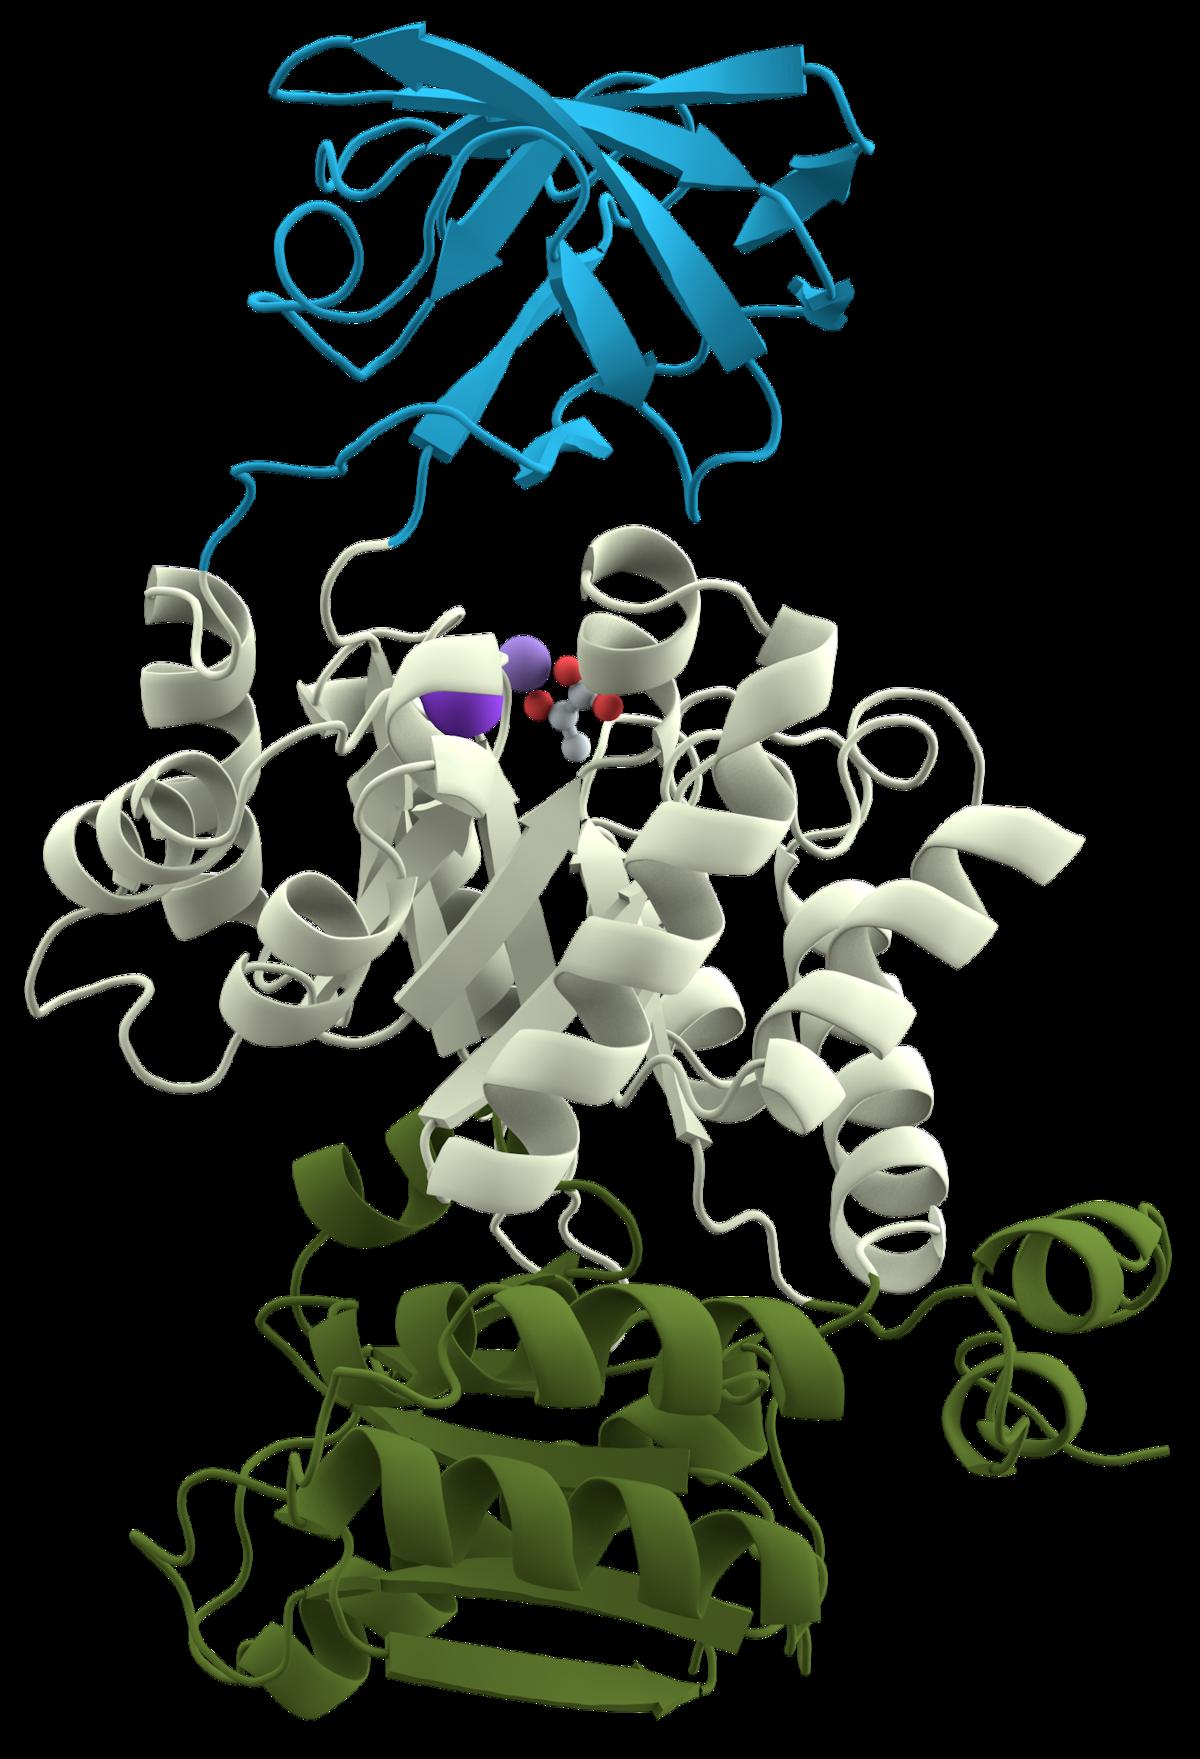 Diversity clipart domain 3. Protein wikipedia